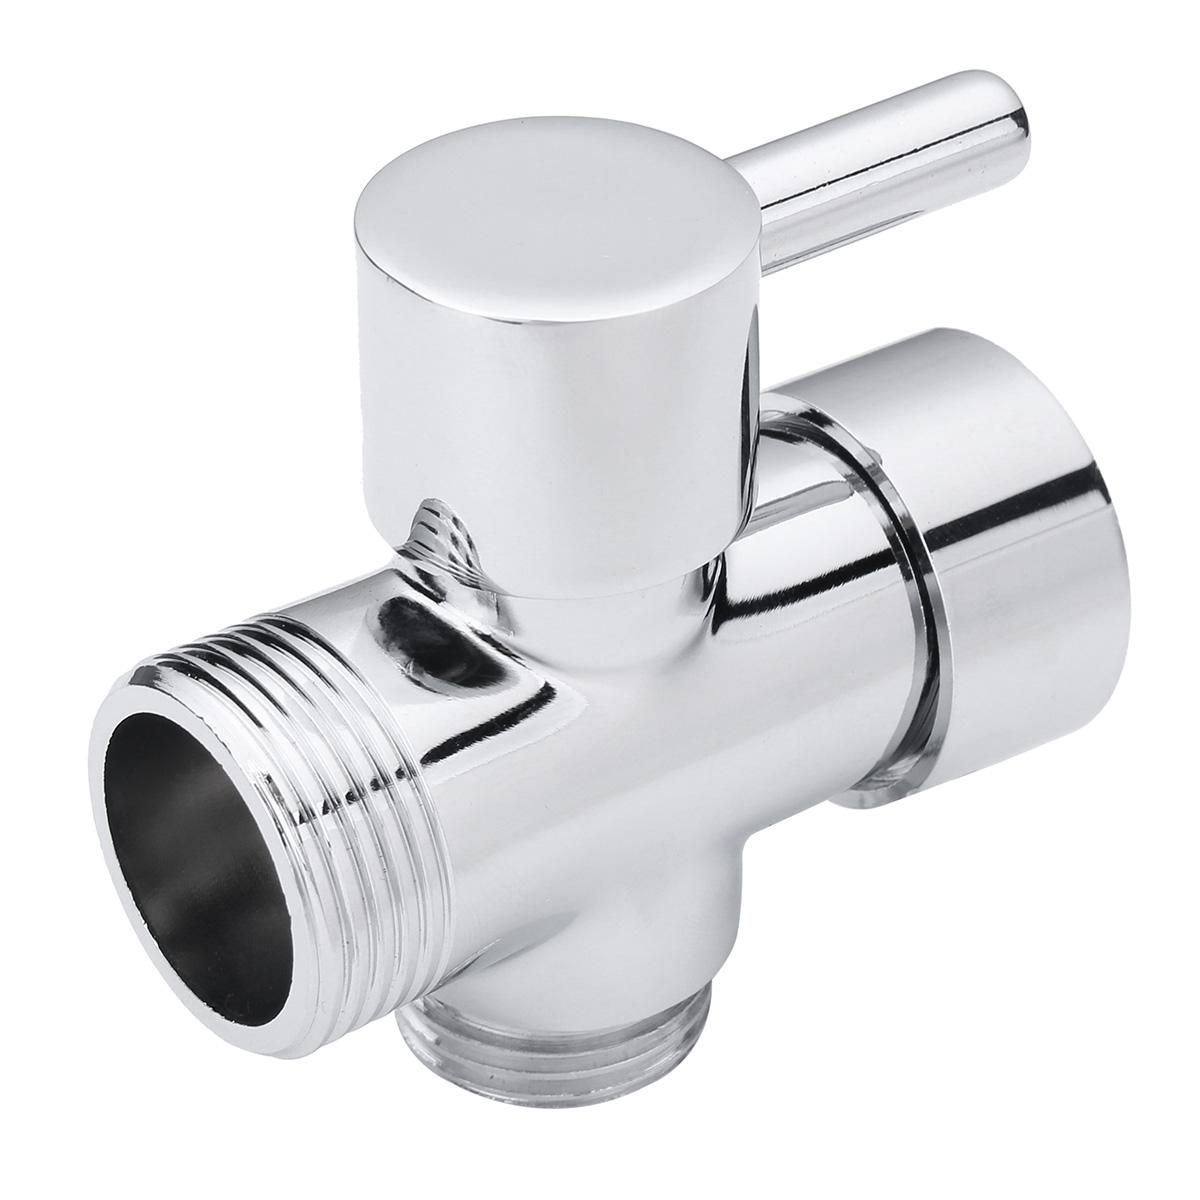 Hand Held Bidet Shattaf Wash Toilet Shower Head Set Bathroom Adapter Spray Jet